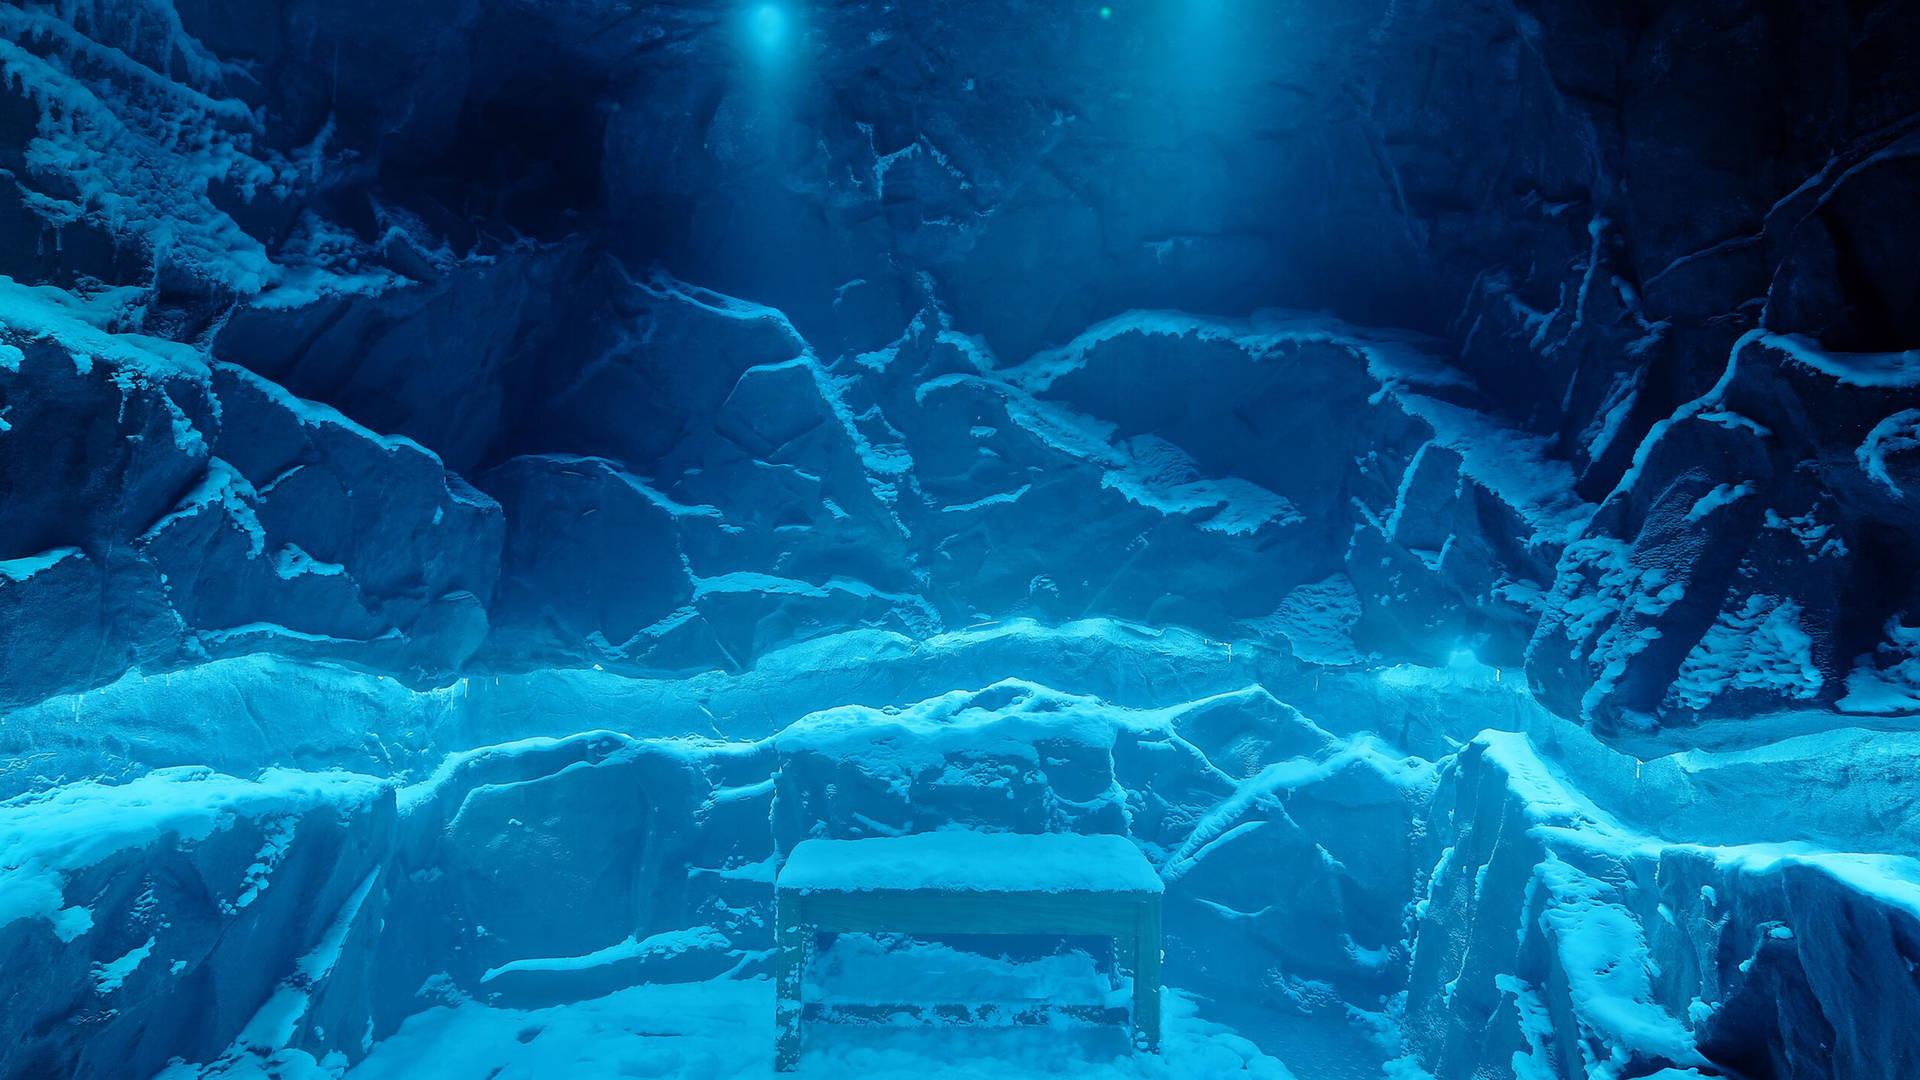 Snow treatment room at Jumeirah Zabeel Saray hotel in Dubai